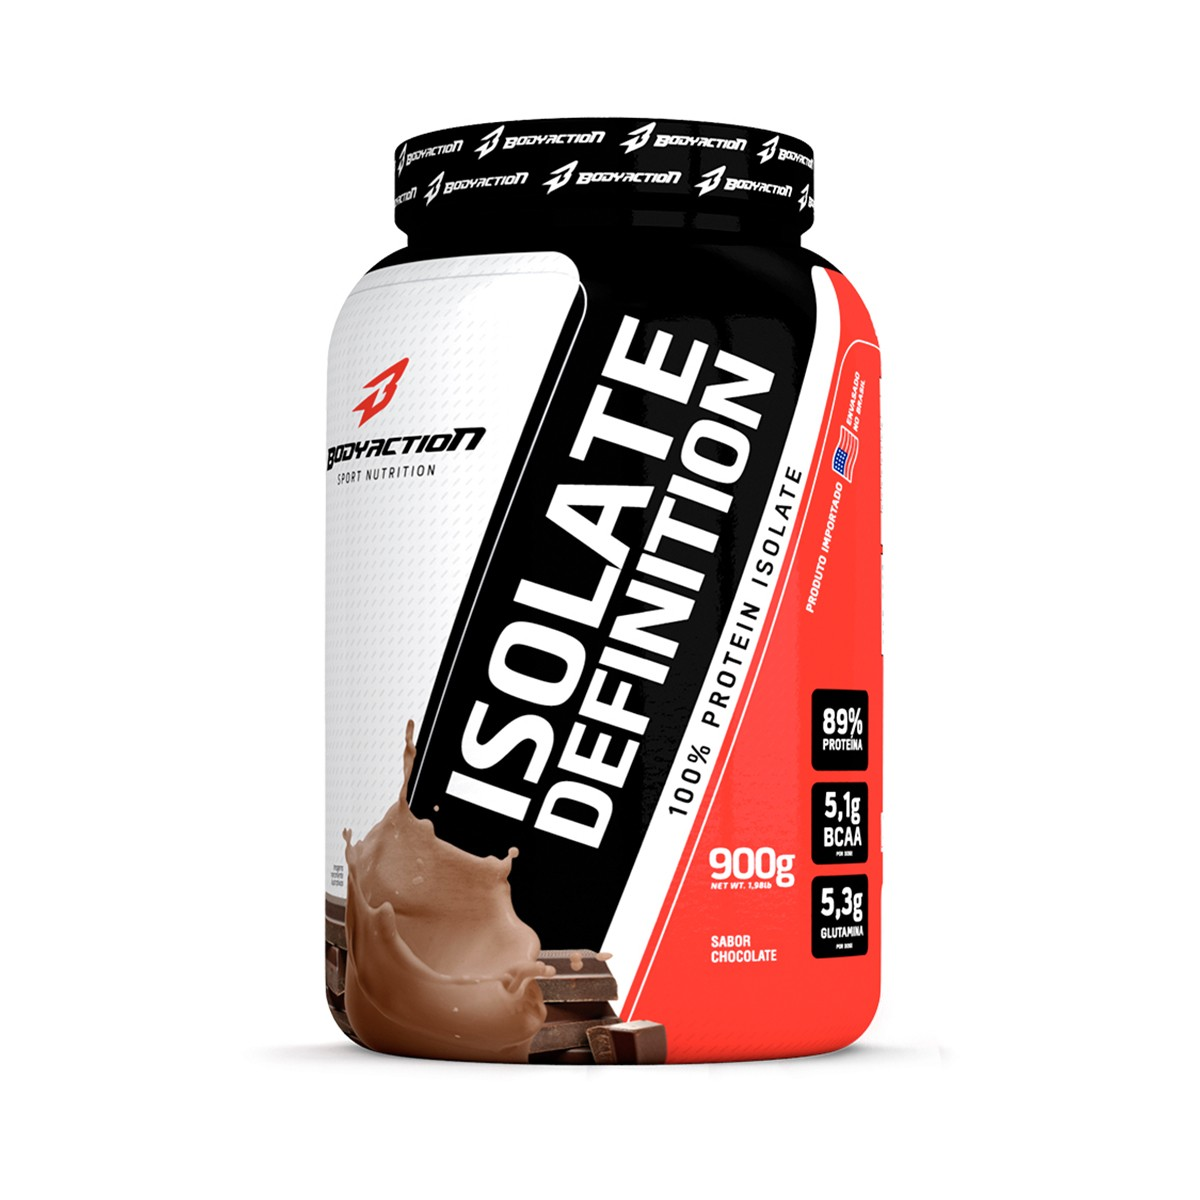 Isolate Definition Chocolate 900g - Bodyaction